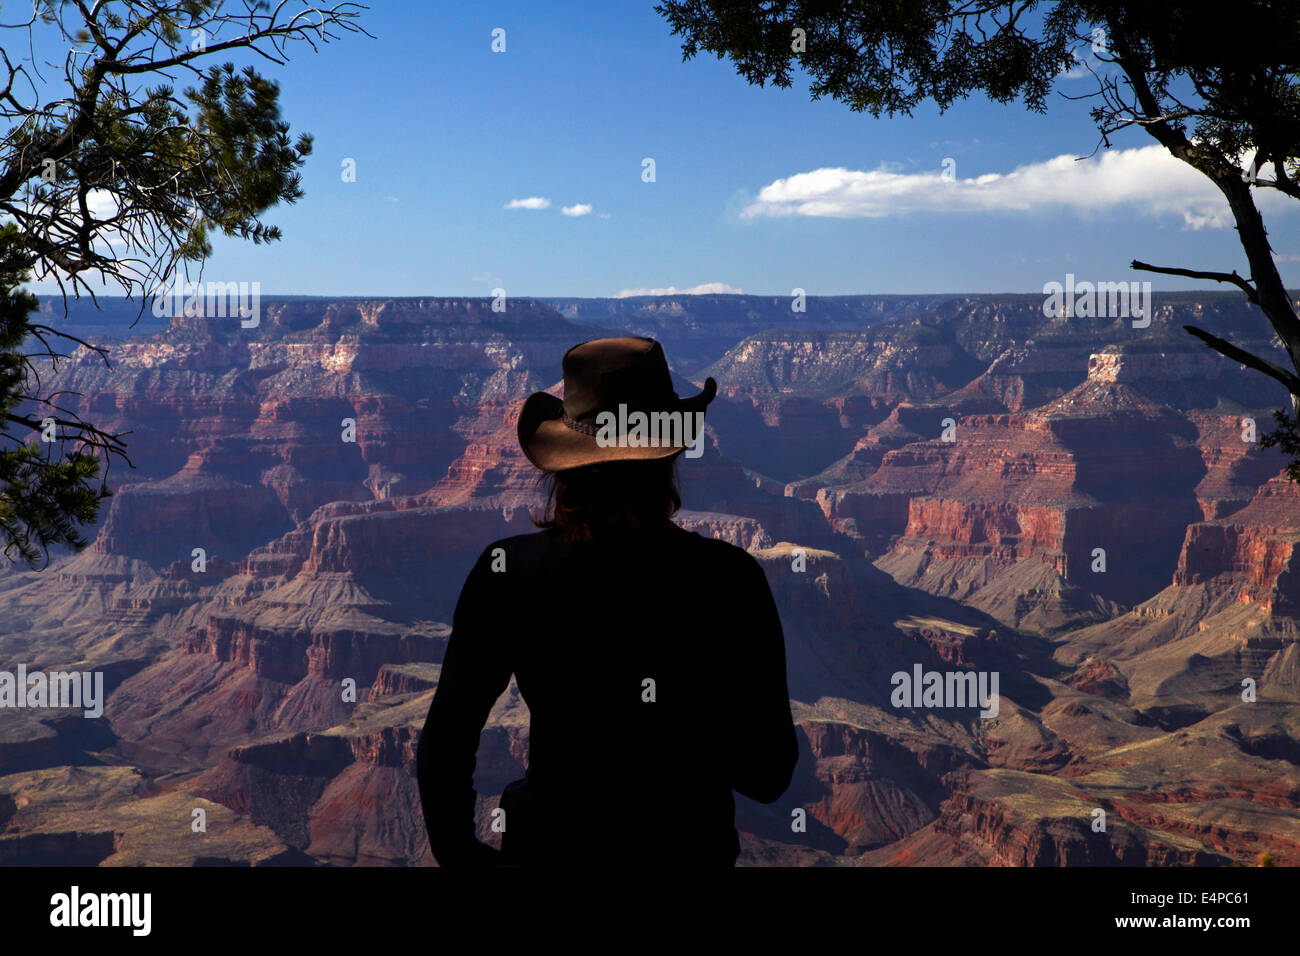 Woman viewing Grand Canyon from South Rim Trail, Grand Canyon National Park, Arizona, USA Stock Photo